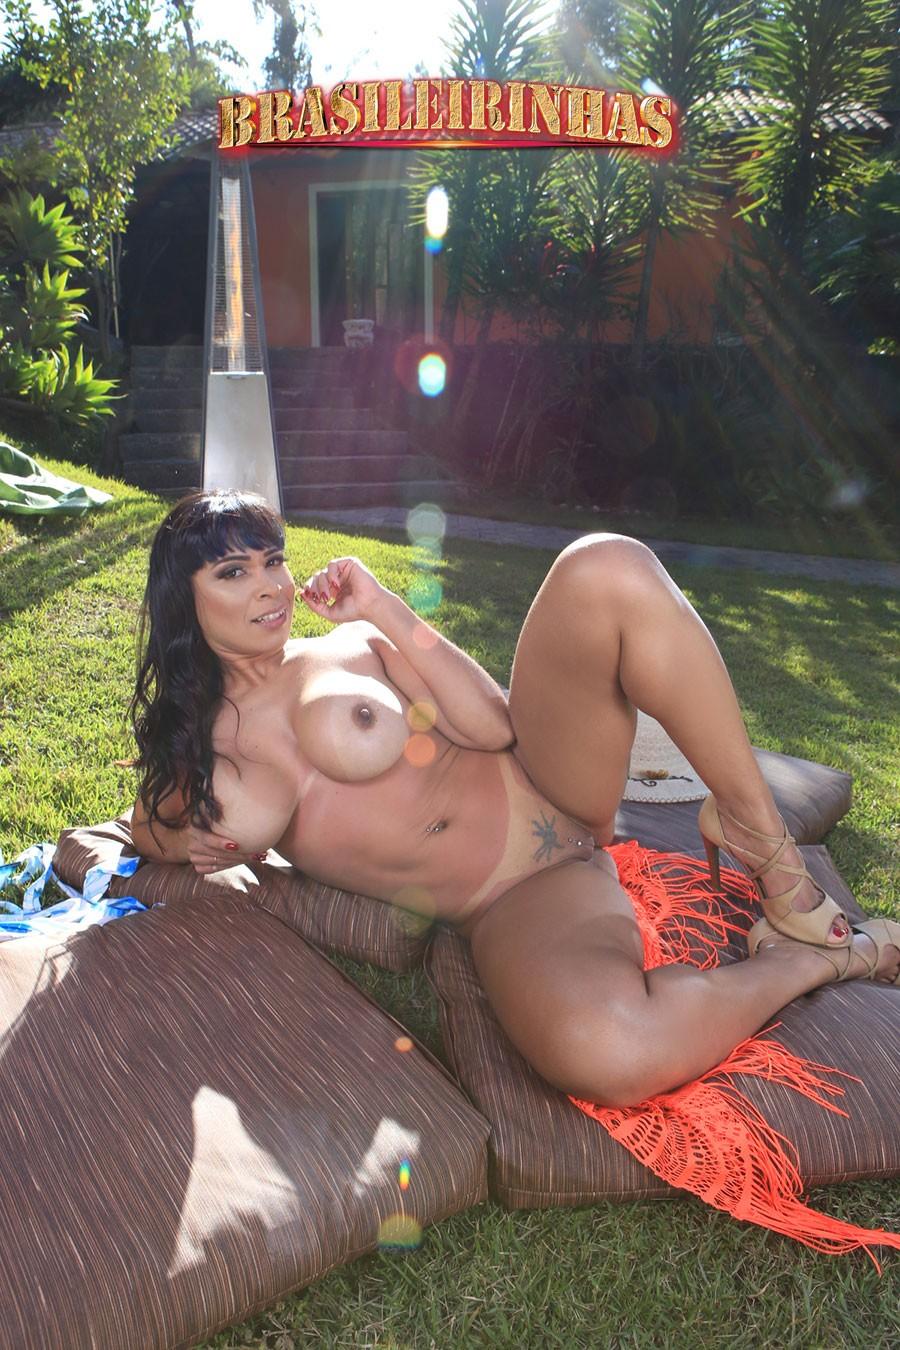 atriz-porno-Jéssica-Winchester-no-jardim.jpg